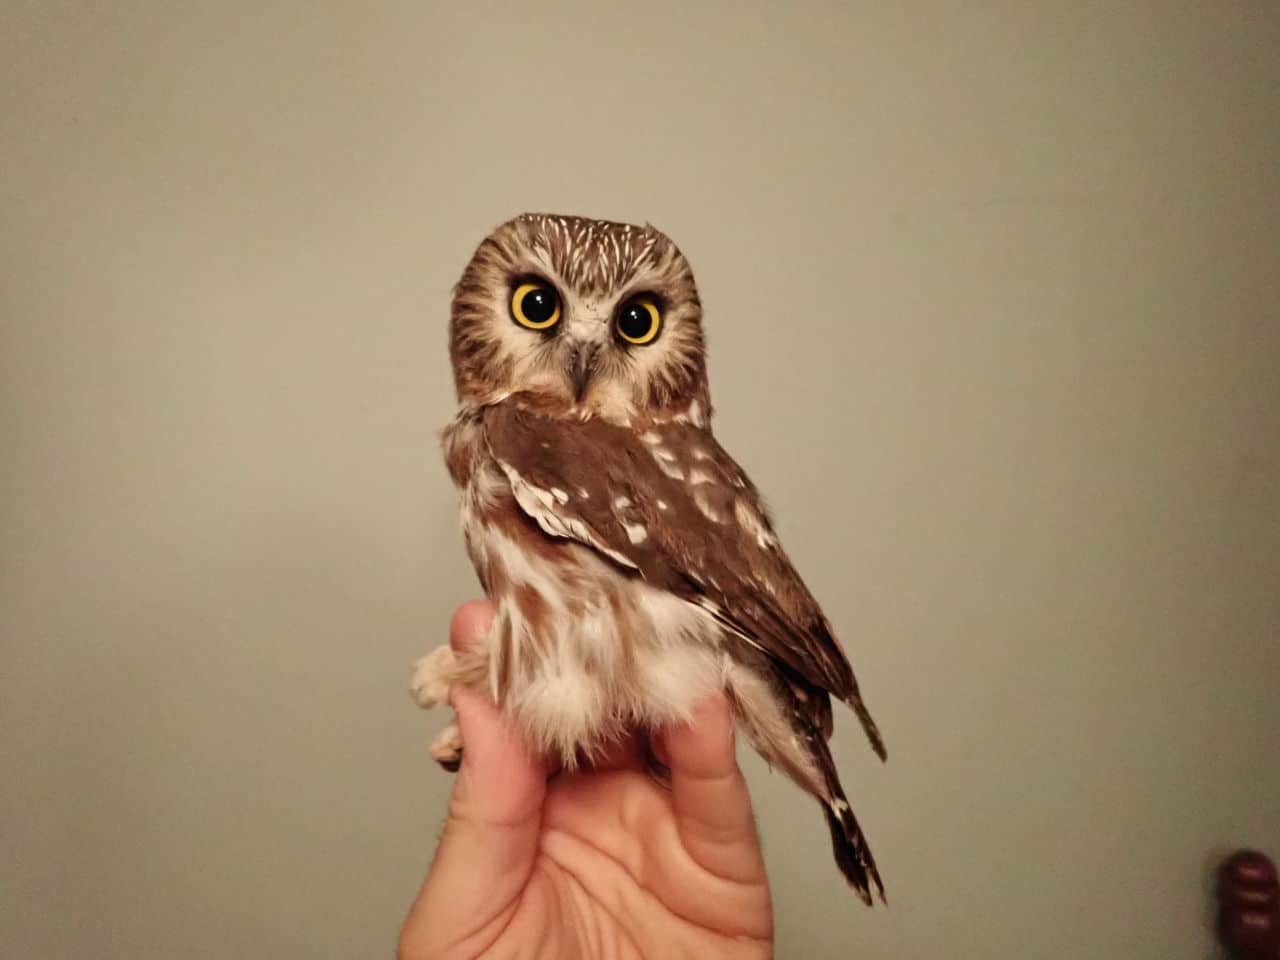 07 Nov 2020 - Northern Saw-whet Owl (female)